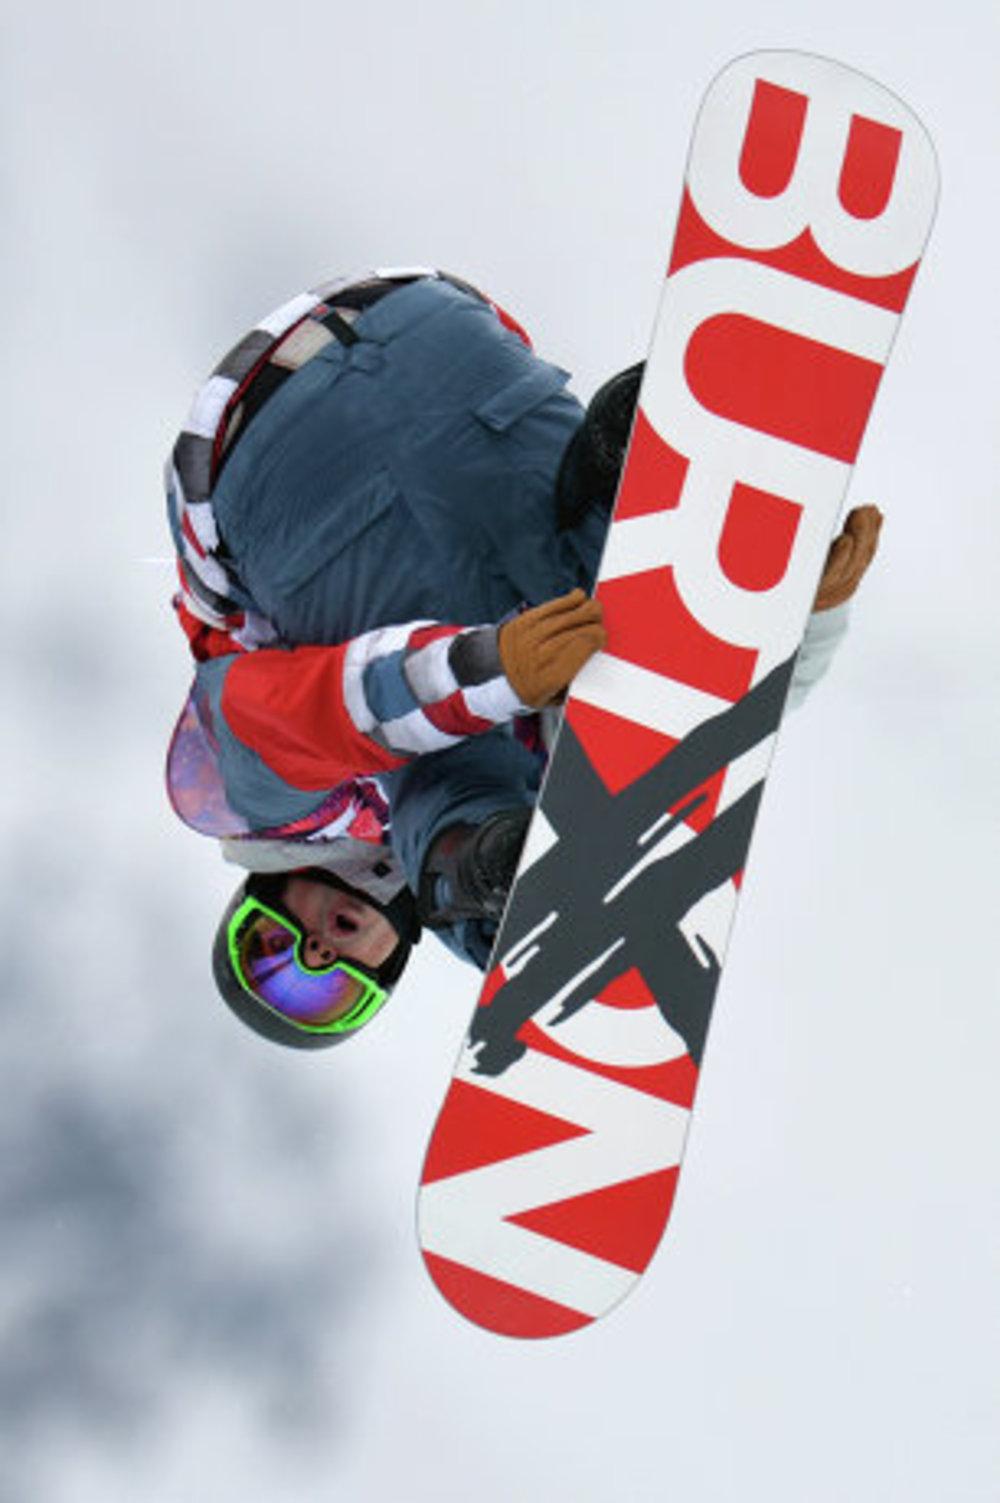 Сноуборд хафпайп олимпиада 19 фотография